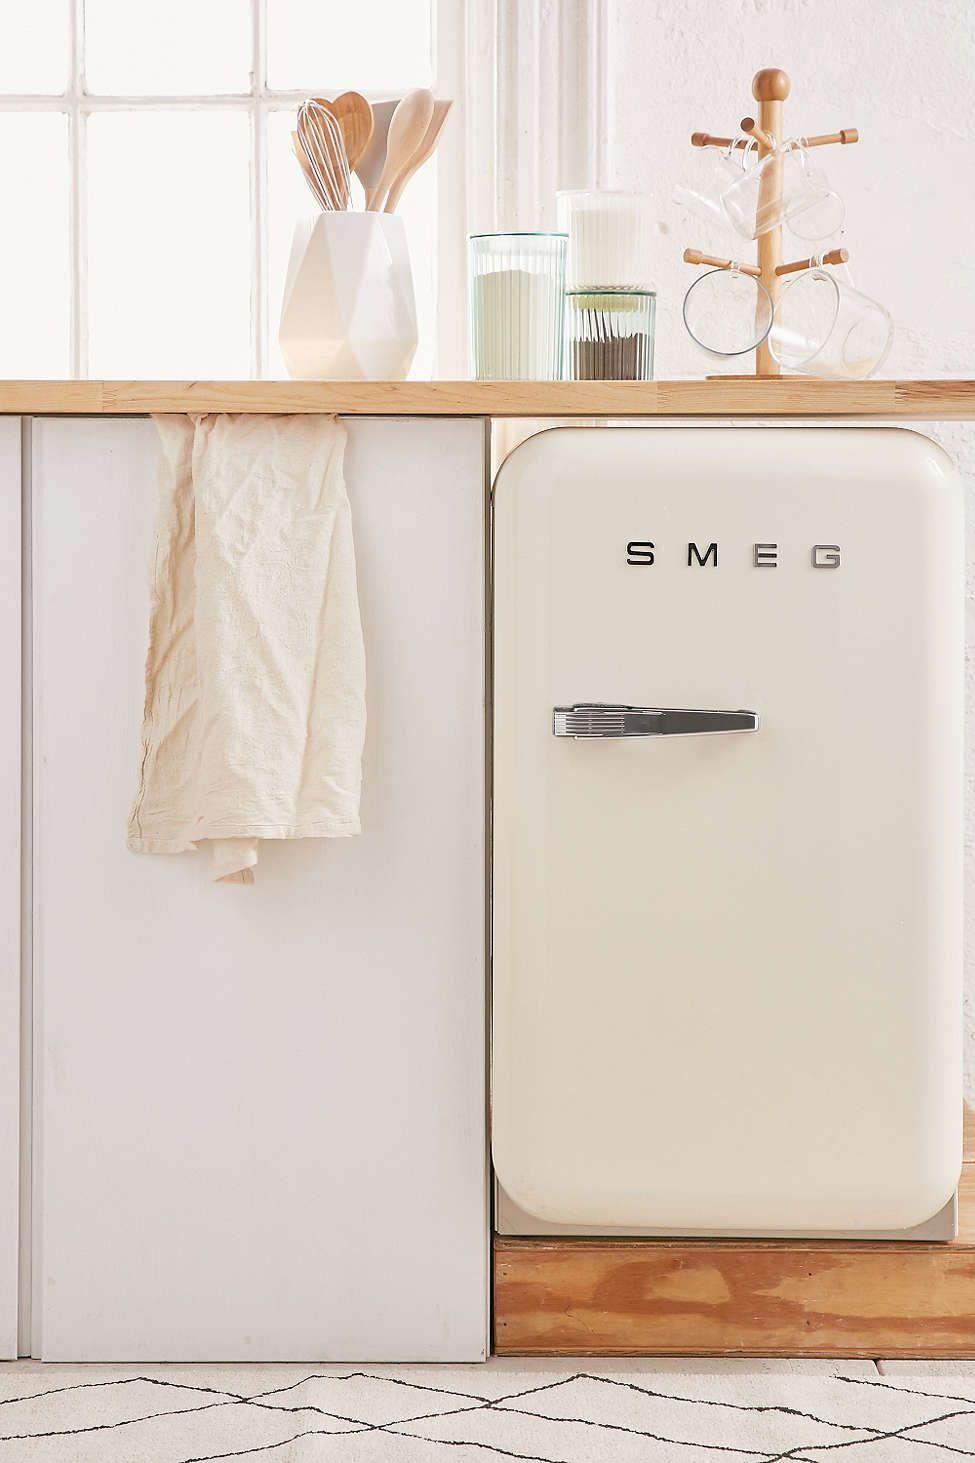 SMEG Mini Refrigerator | PLAYROOM by Beyoonaful | Pinterest ...